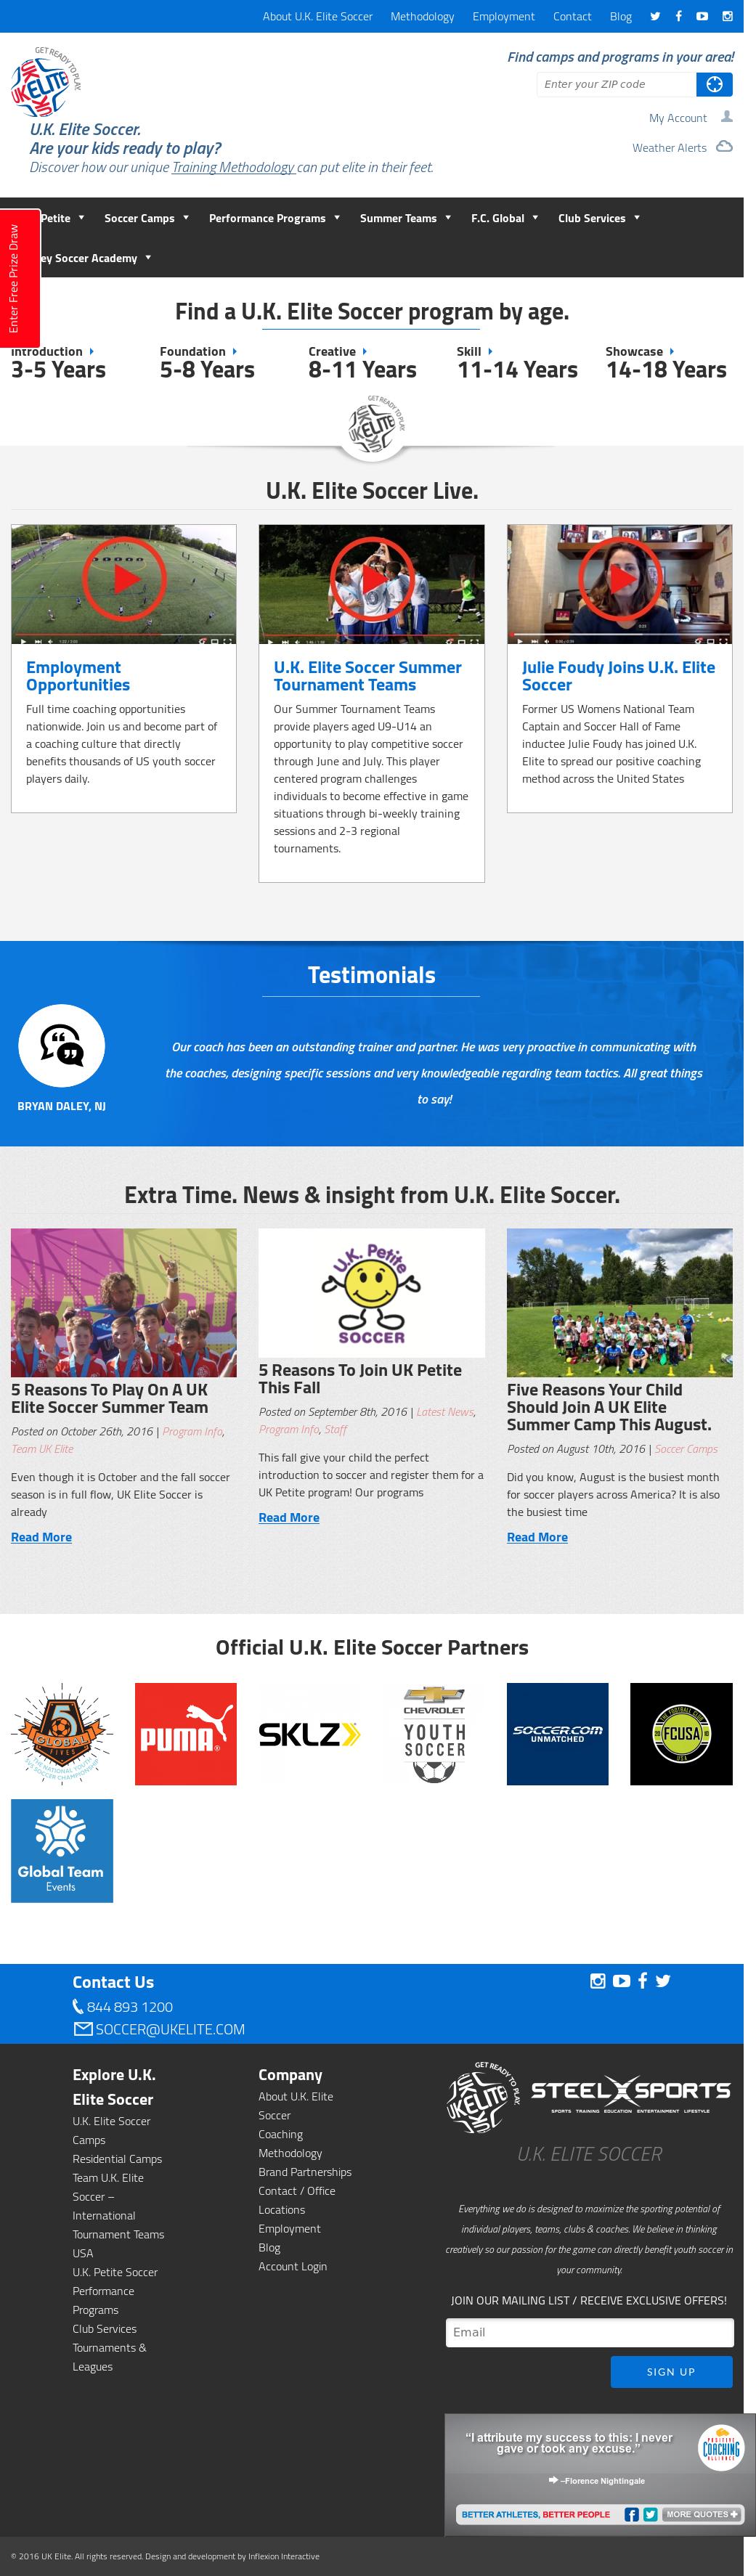 fddac1b0c U.K. Elite Soccer Competitors, Revenue and Employees - Owler Company Profile